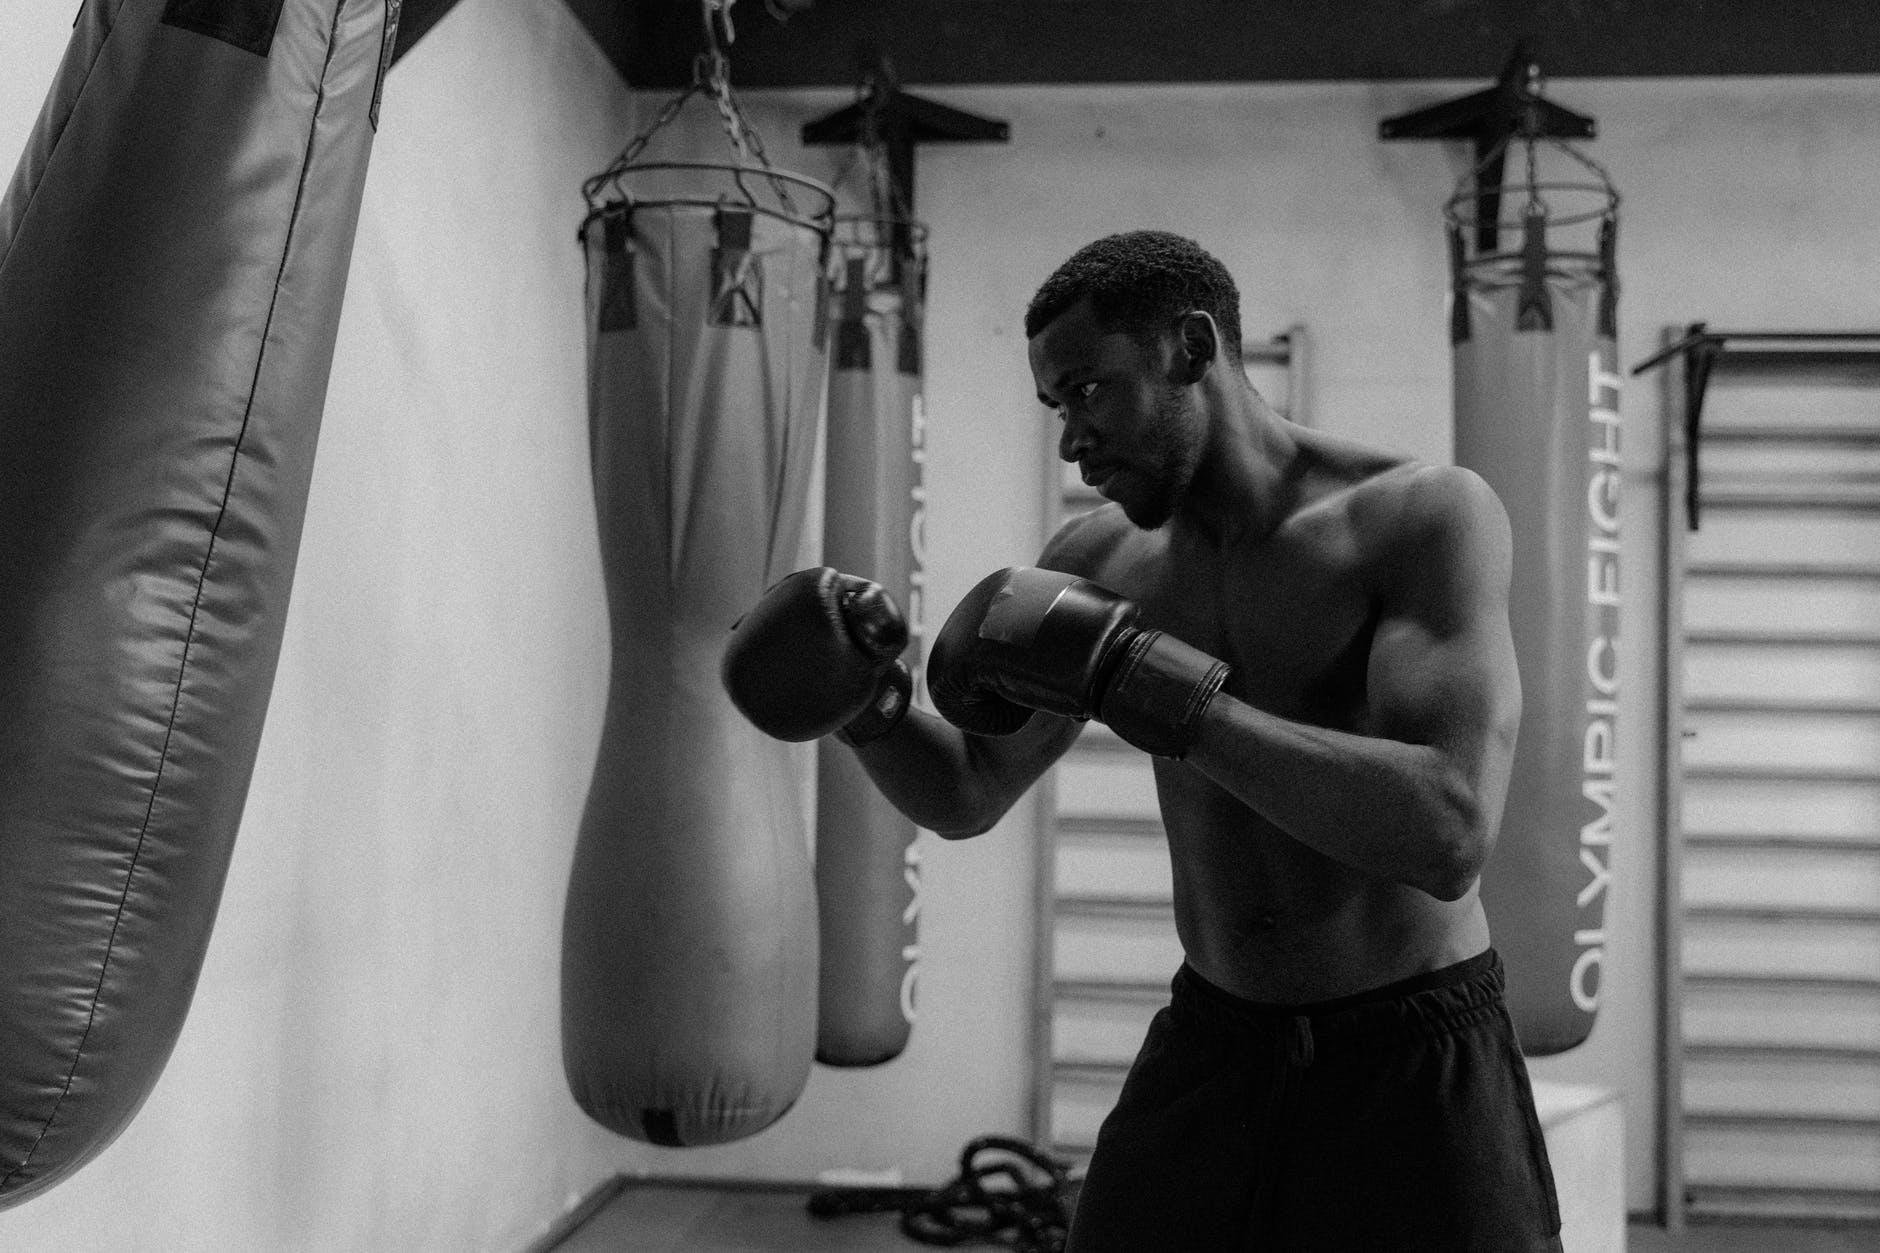 topless man wearing boxing gloves